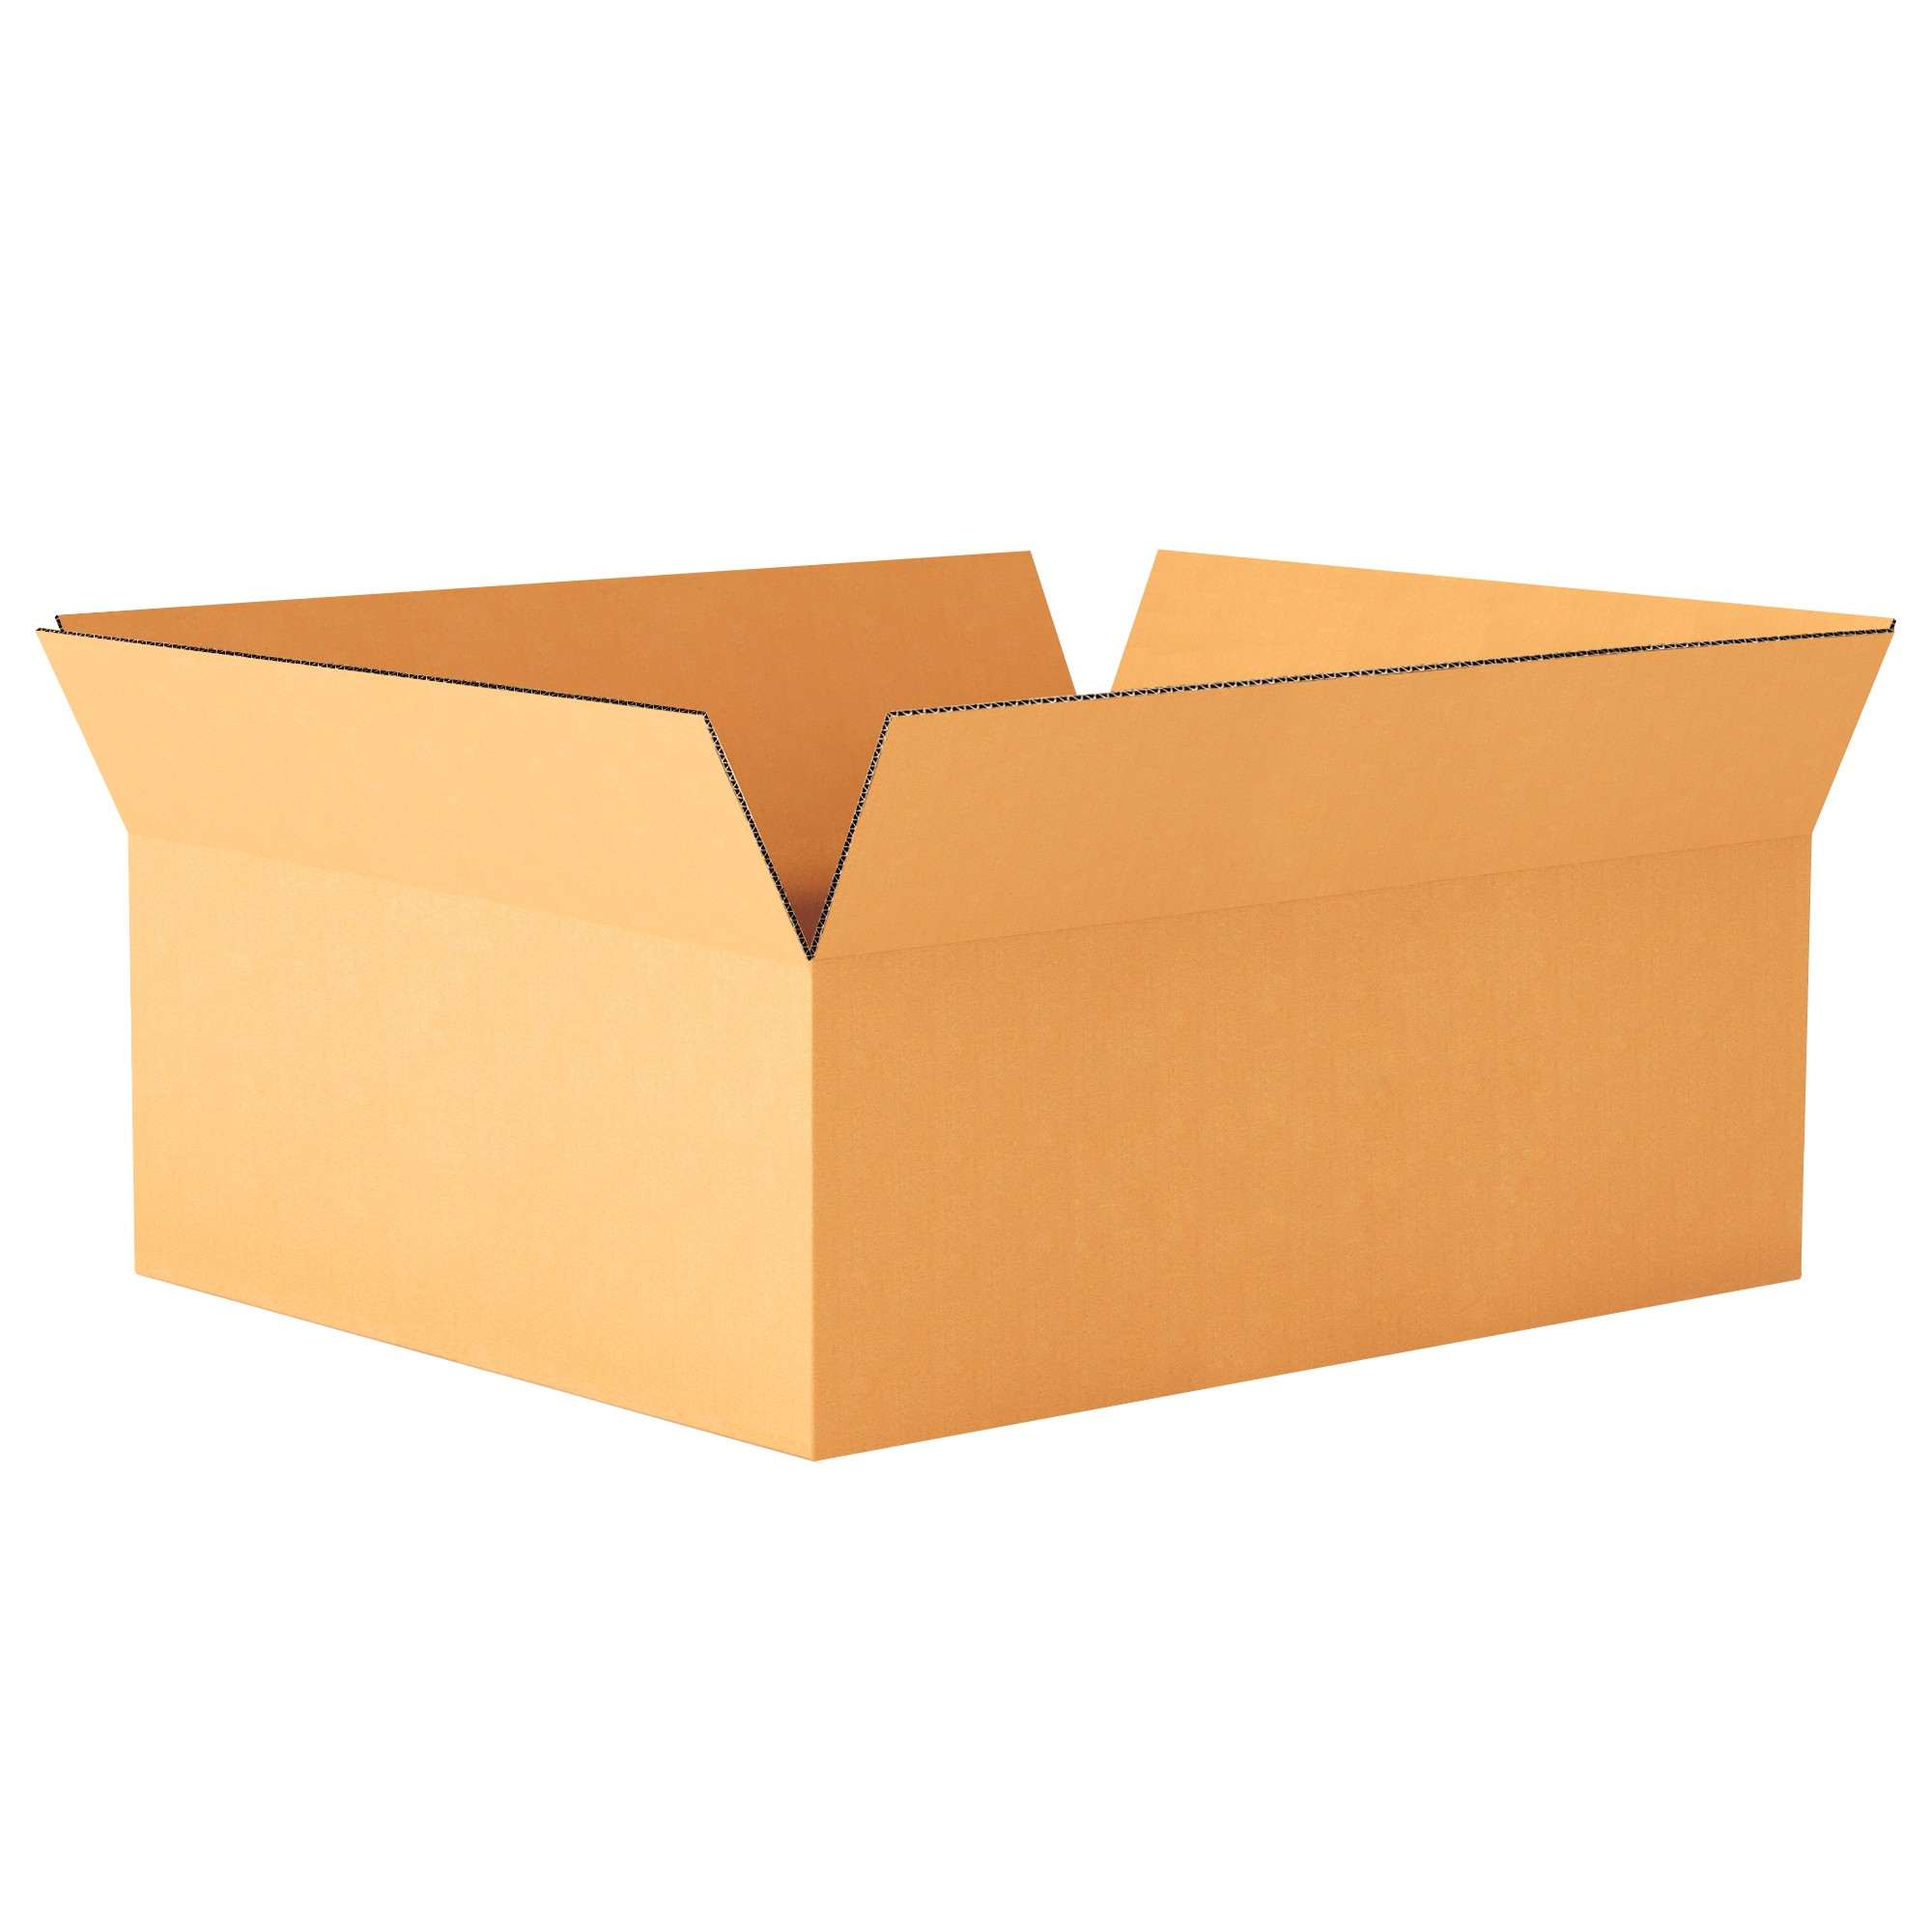 "TOTALPACK® 24 x 18 x 18"" Single Wall Corrugated Laydown Boxes 15 Units"